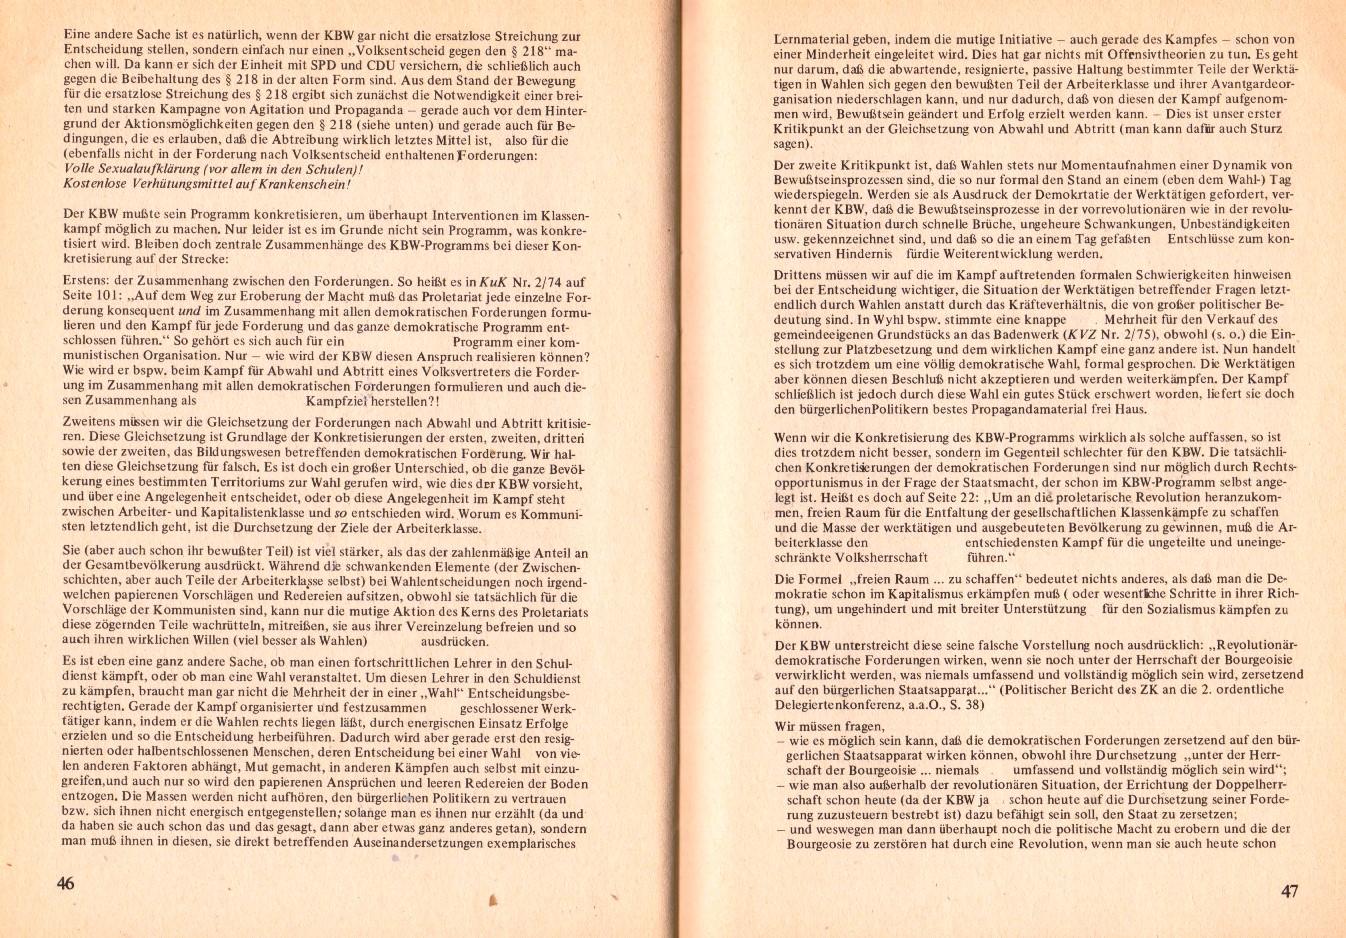 Spartacus_1975_Kritik_des_KBW_25